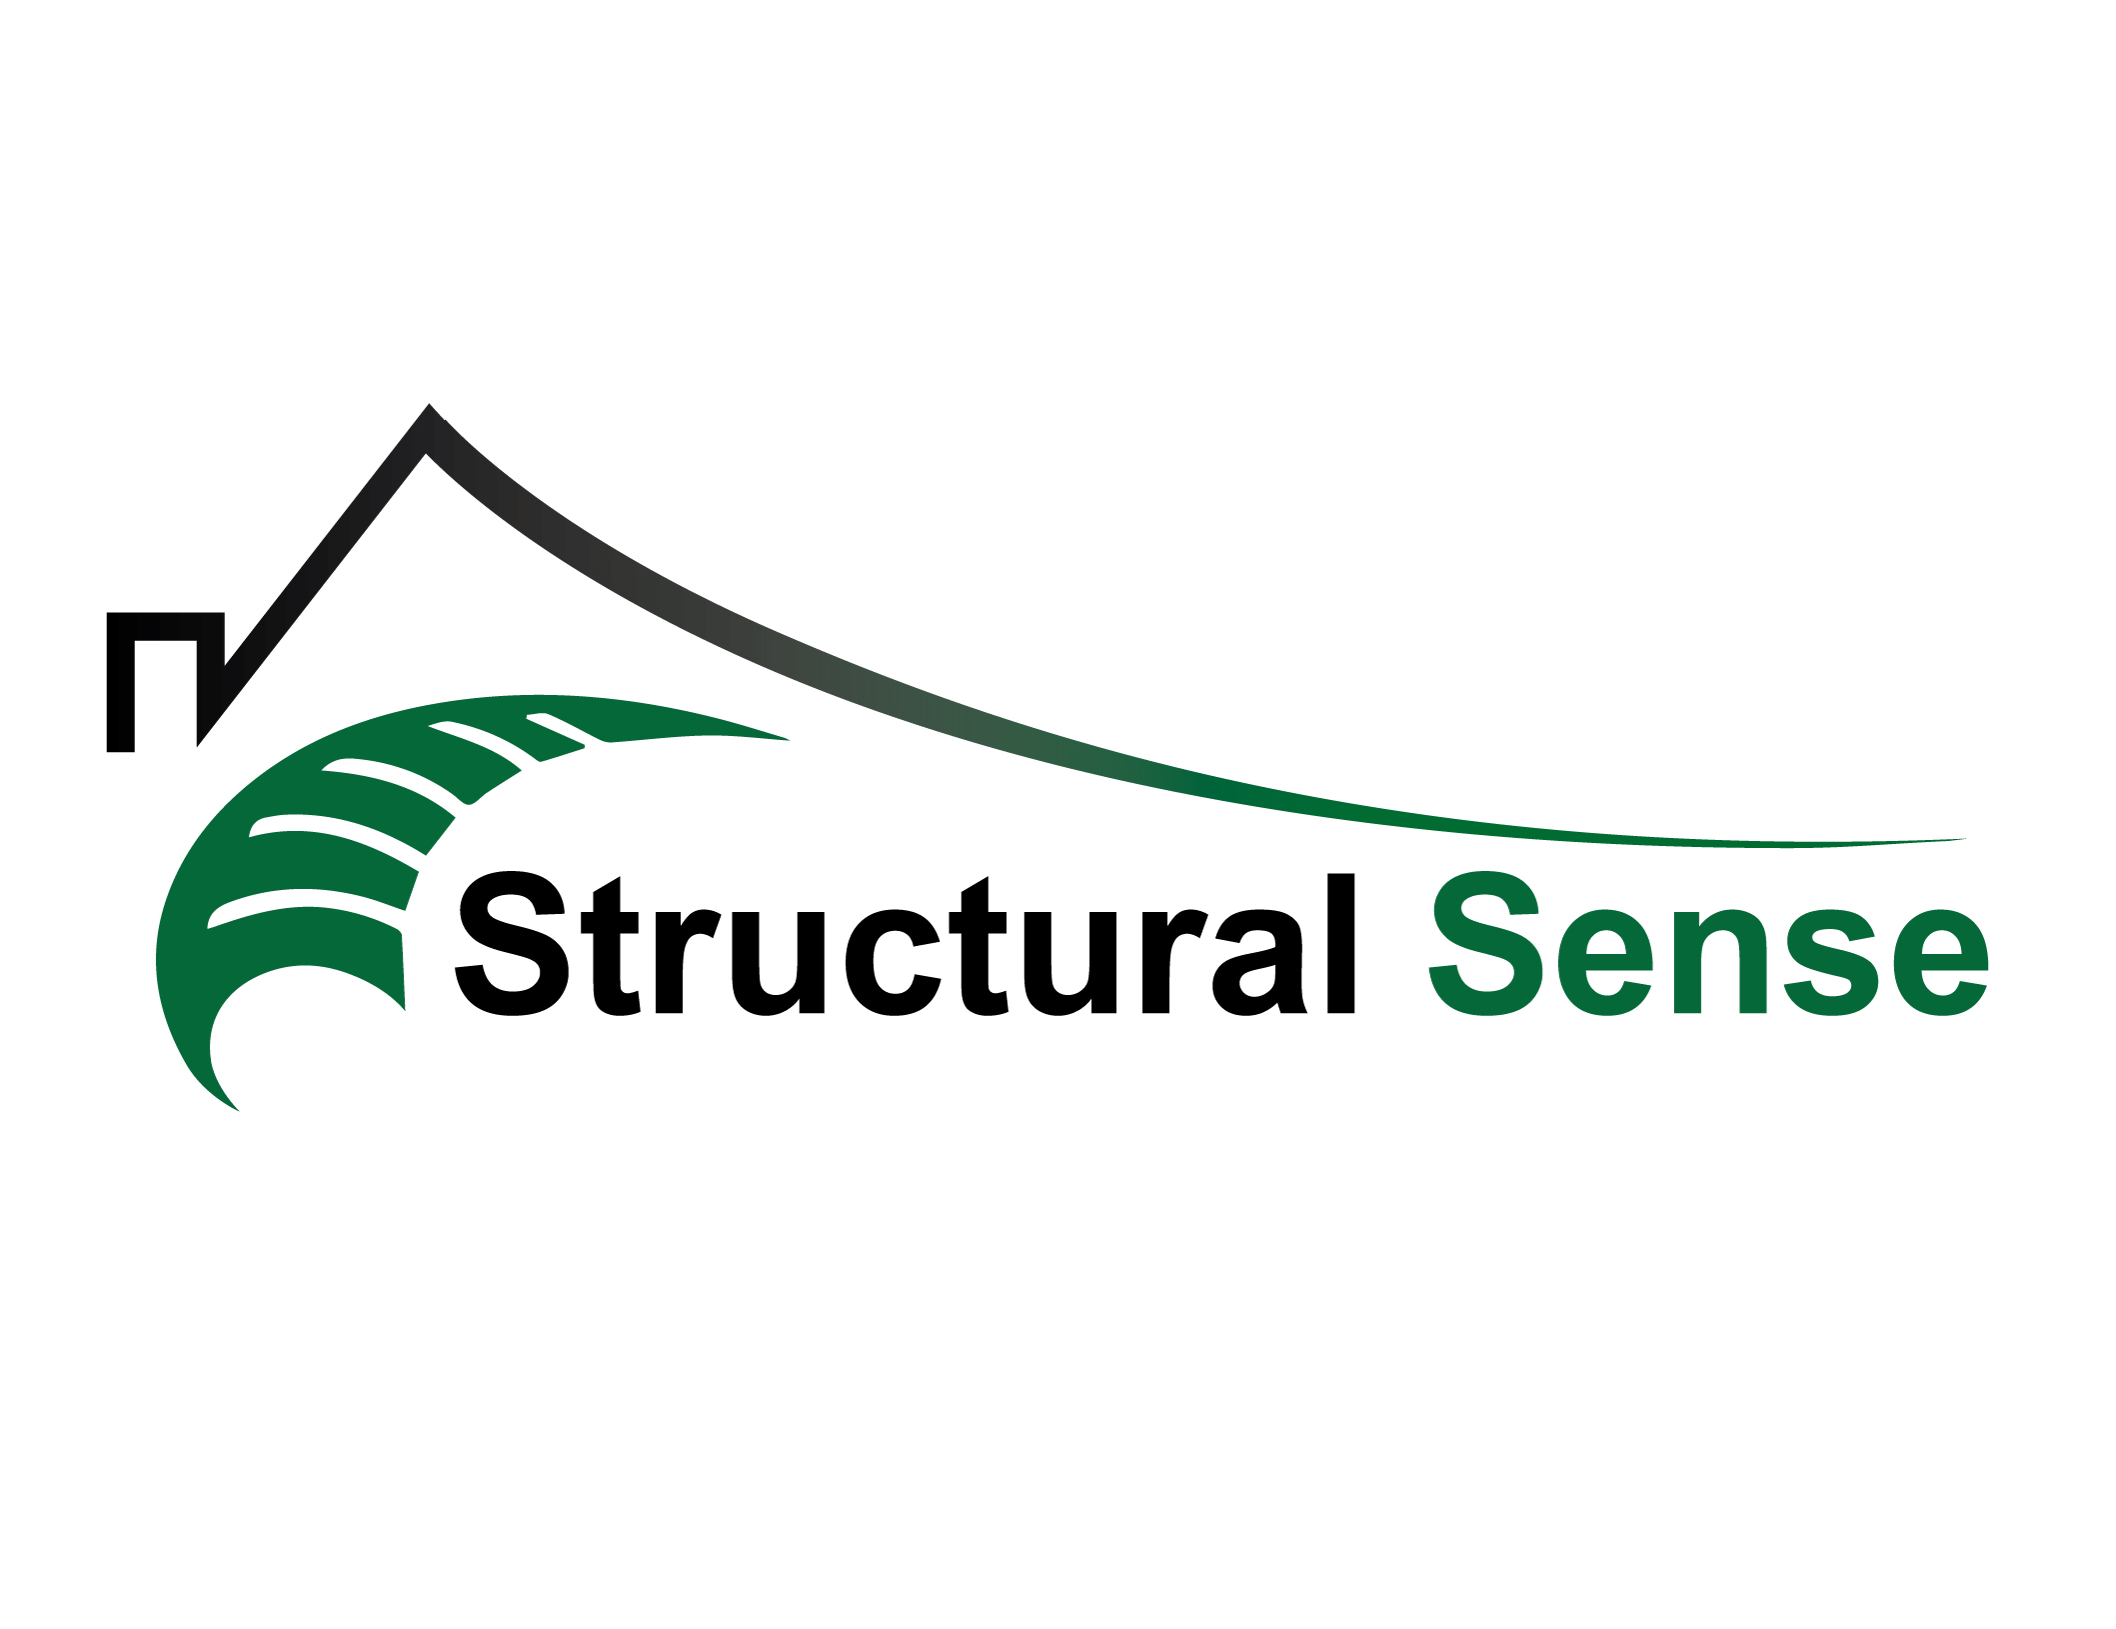 Structural Sense Ltd